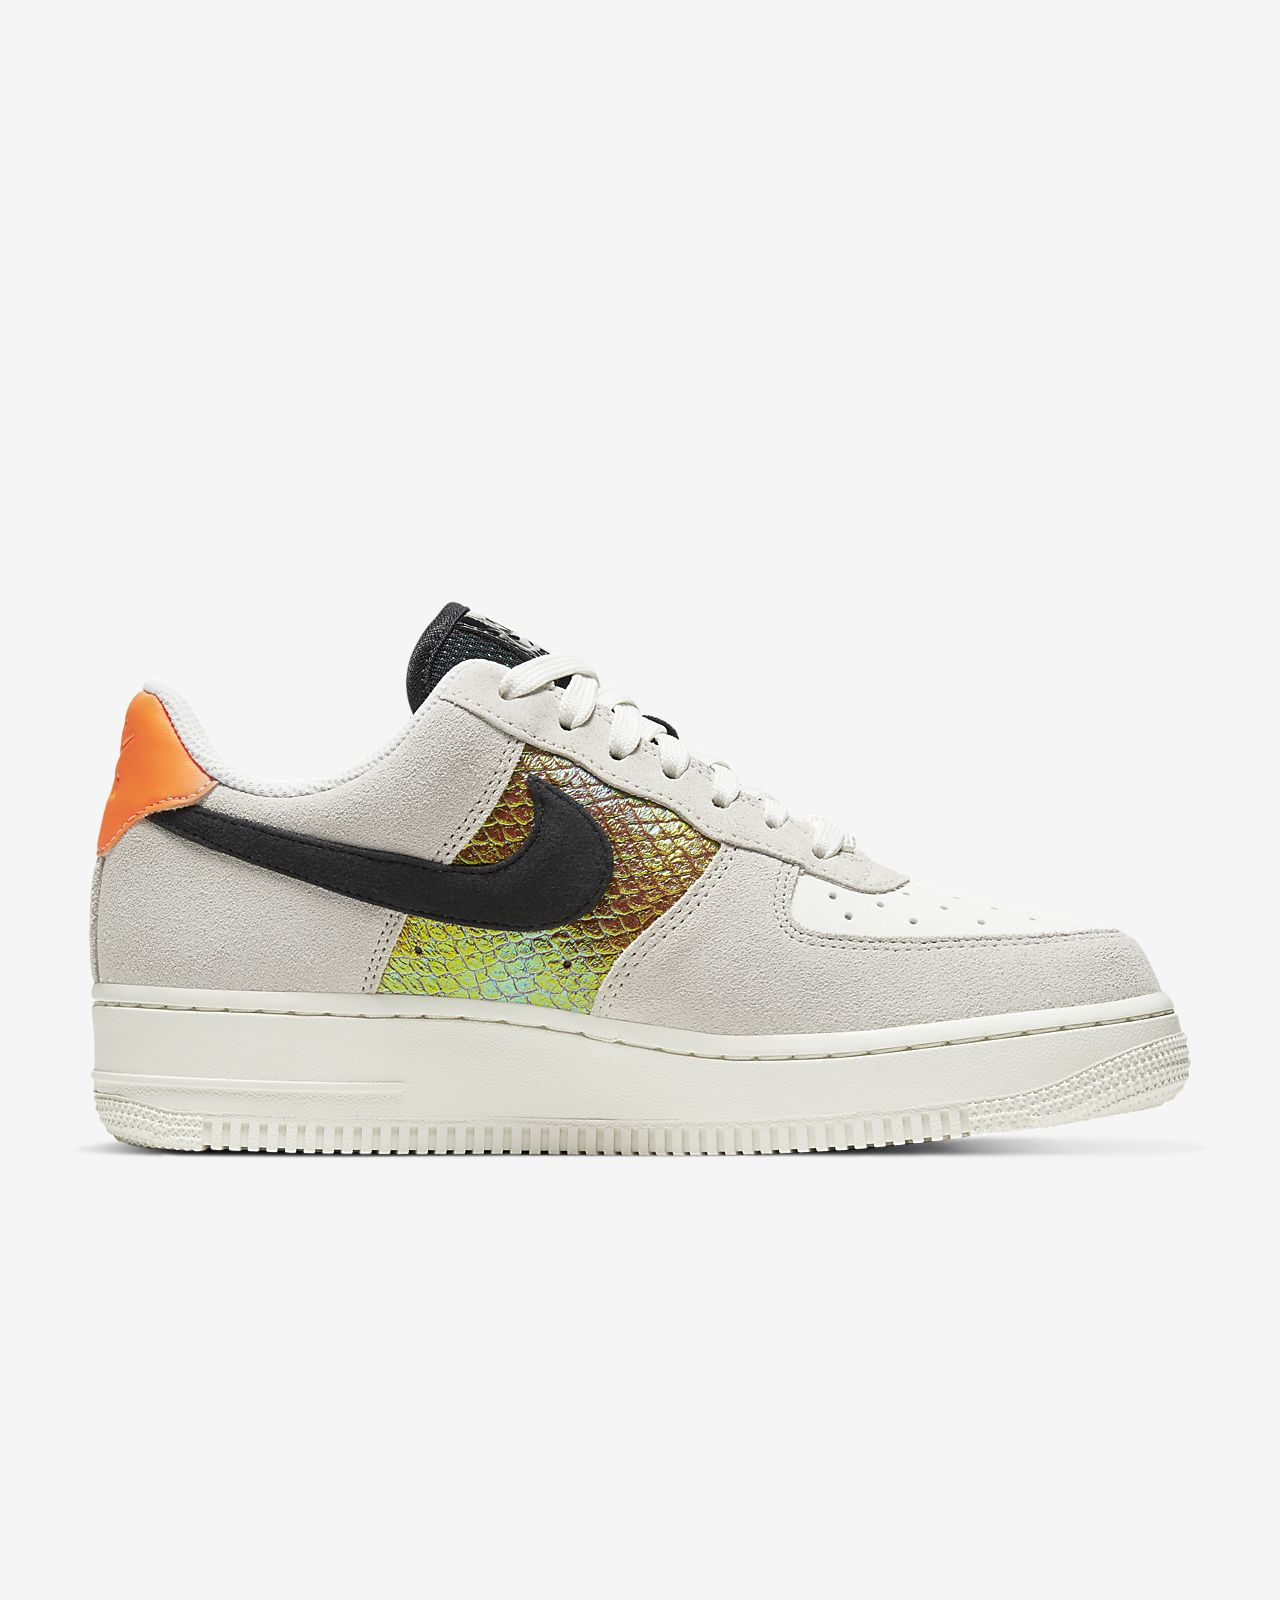 Sapatilhas Nike Air Force 1 Low para mulher